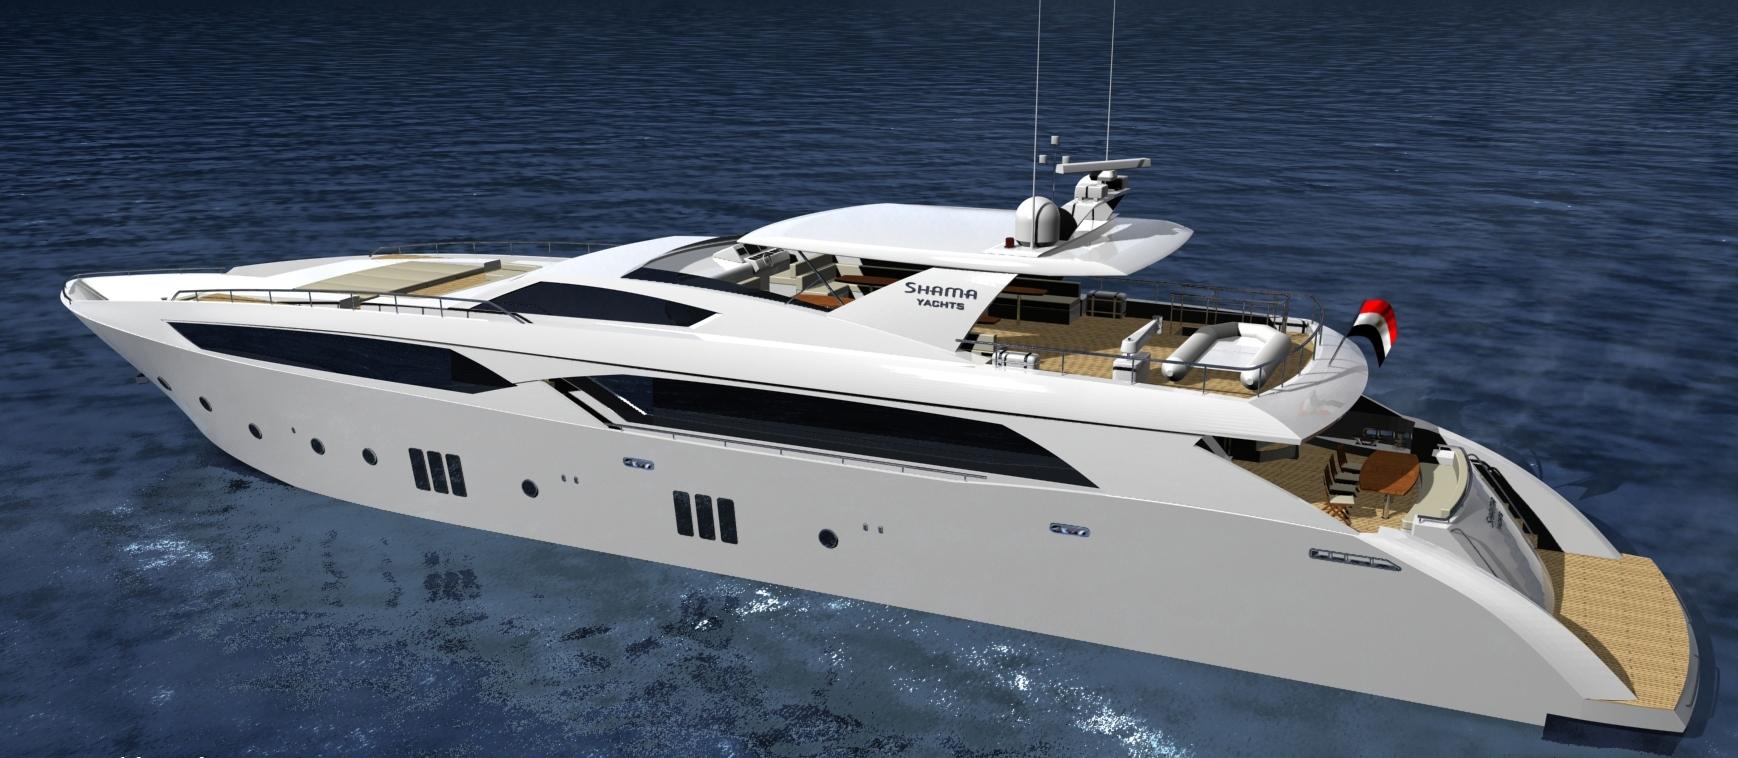 Shama Yachts — Yacht Charter & Superyacht News